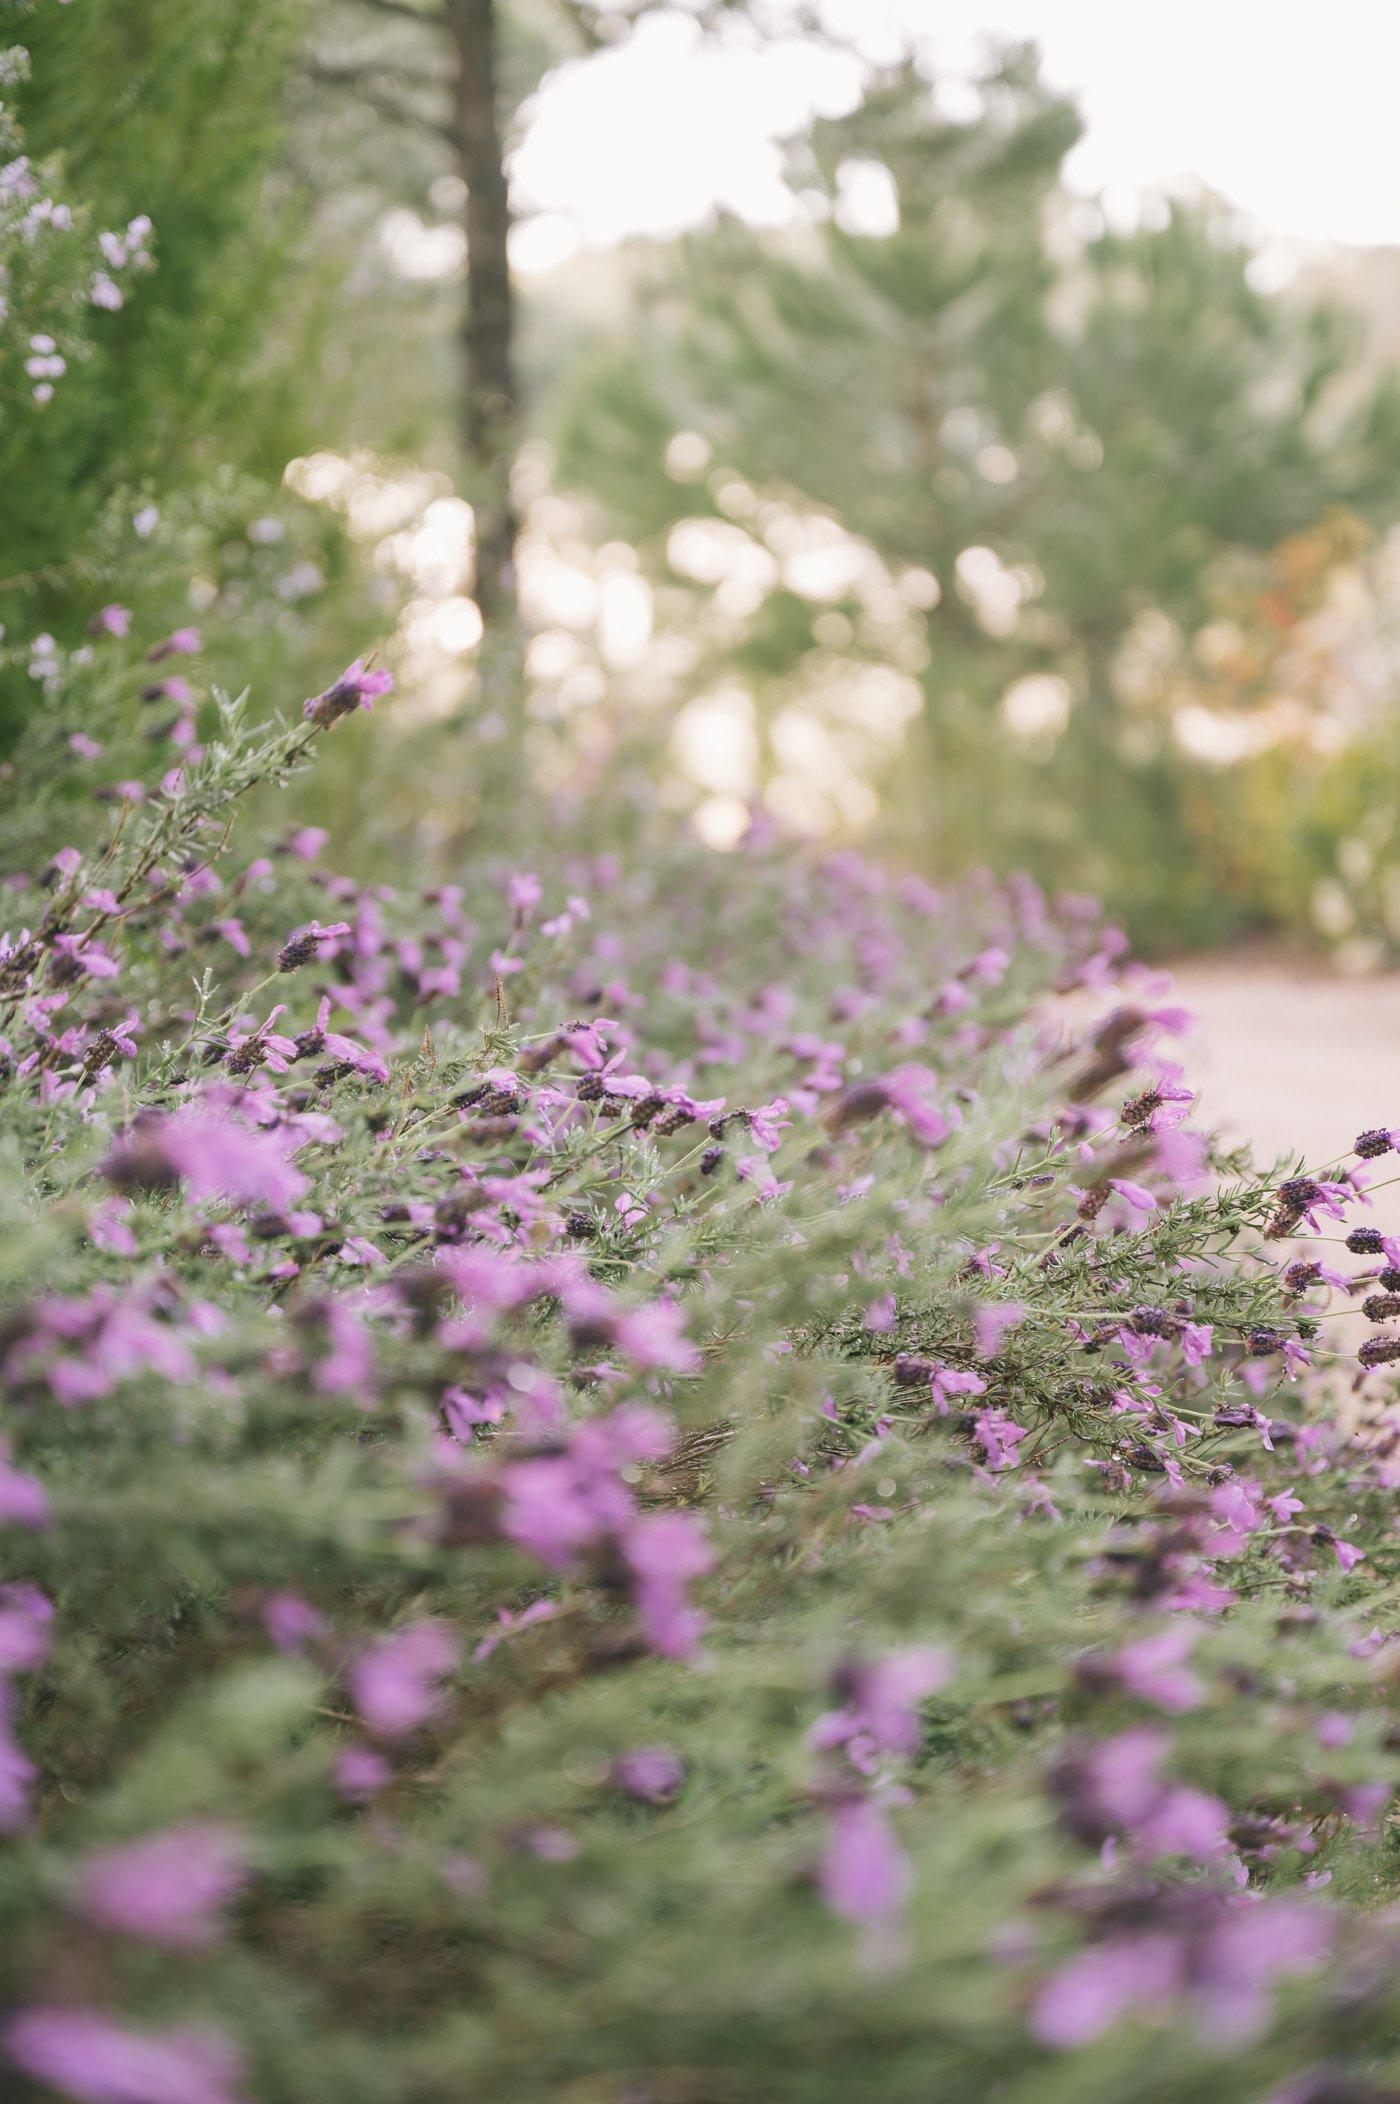 Lavender in bloom in April at Sublime Comporta